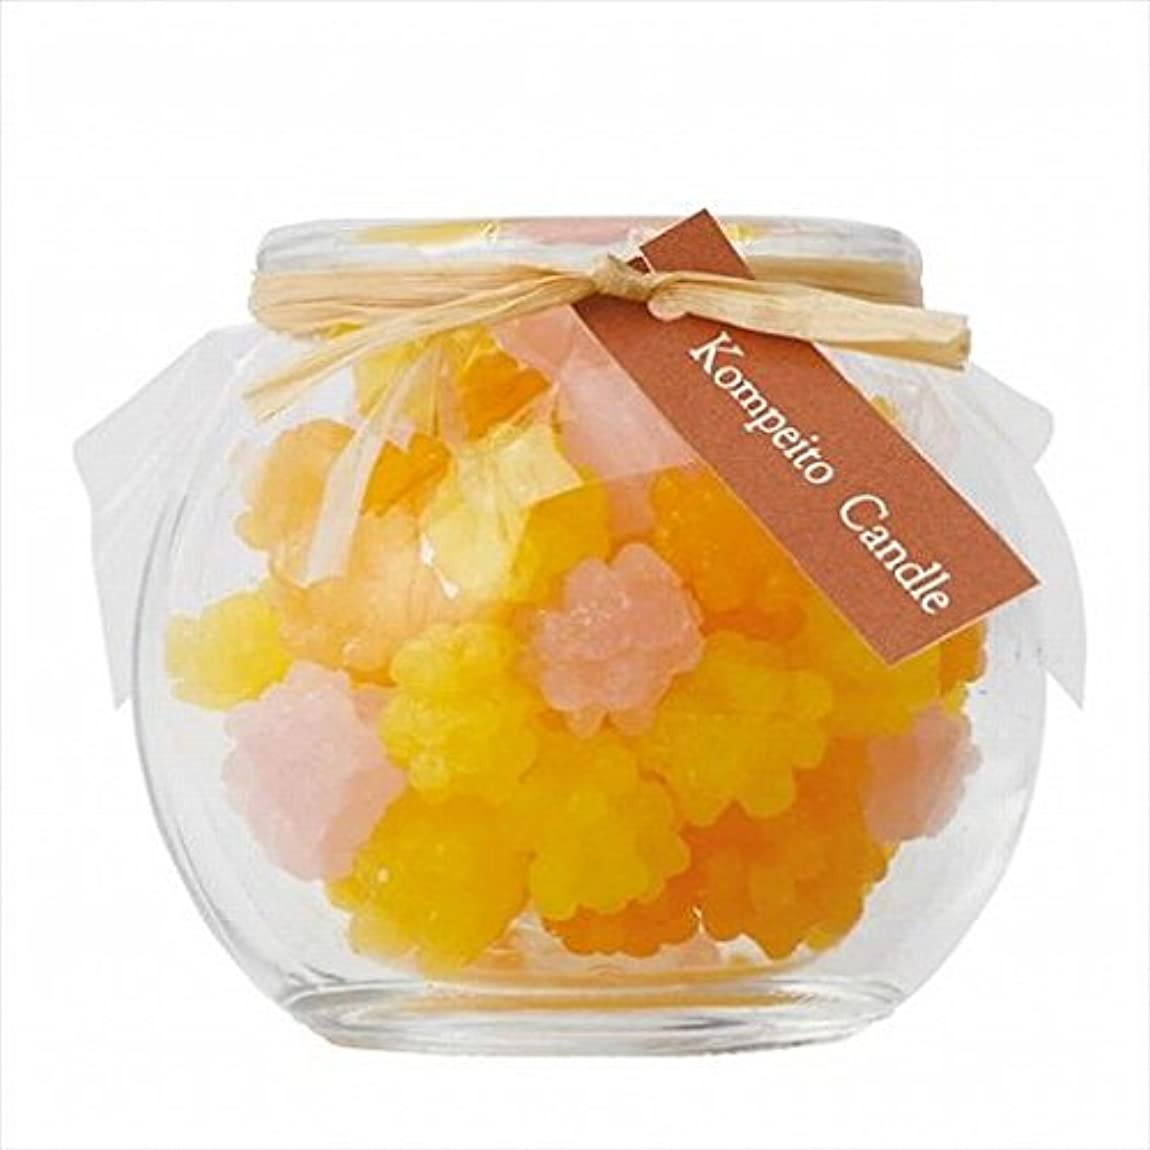 sweets candle(スイーツキャンドル) こんぺいとう 「 イエロー 」 キャンドル 65x65x58mm (A6500000Y)